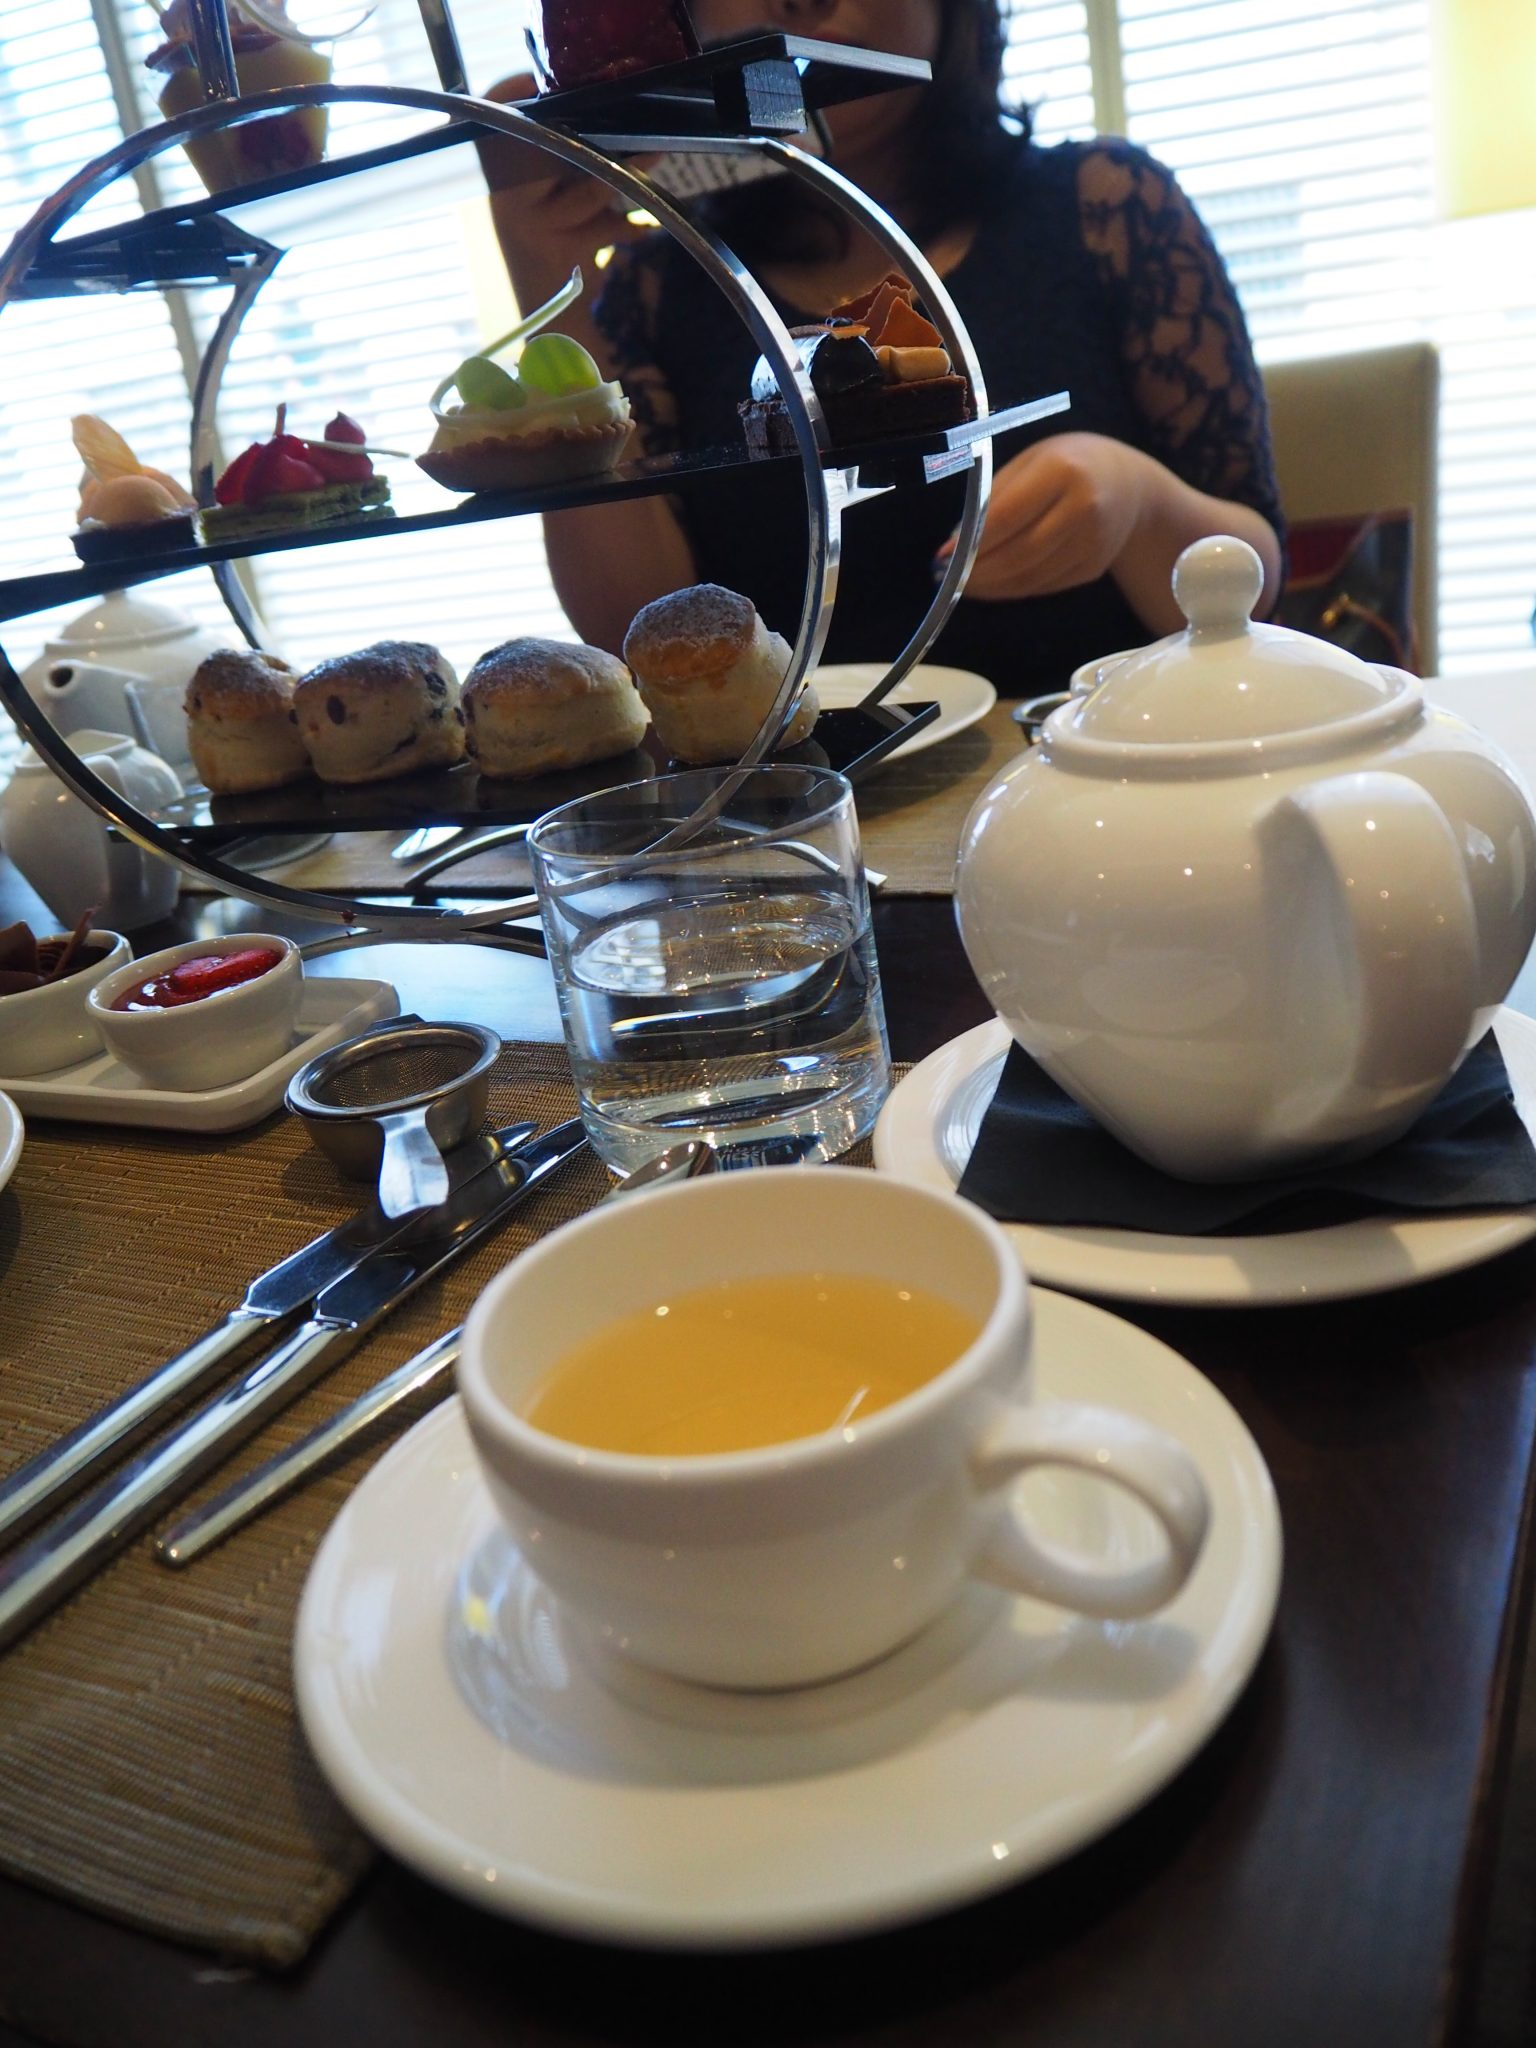 Chocoholic Afternoon Tea at The Hilton Park Lane